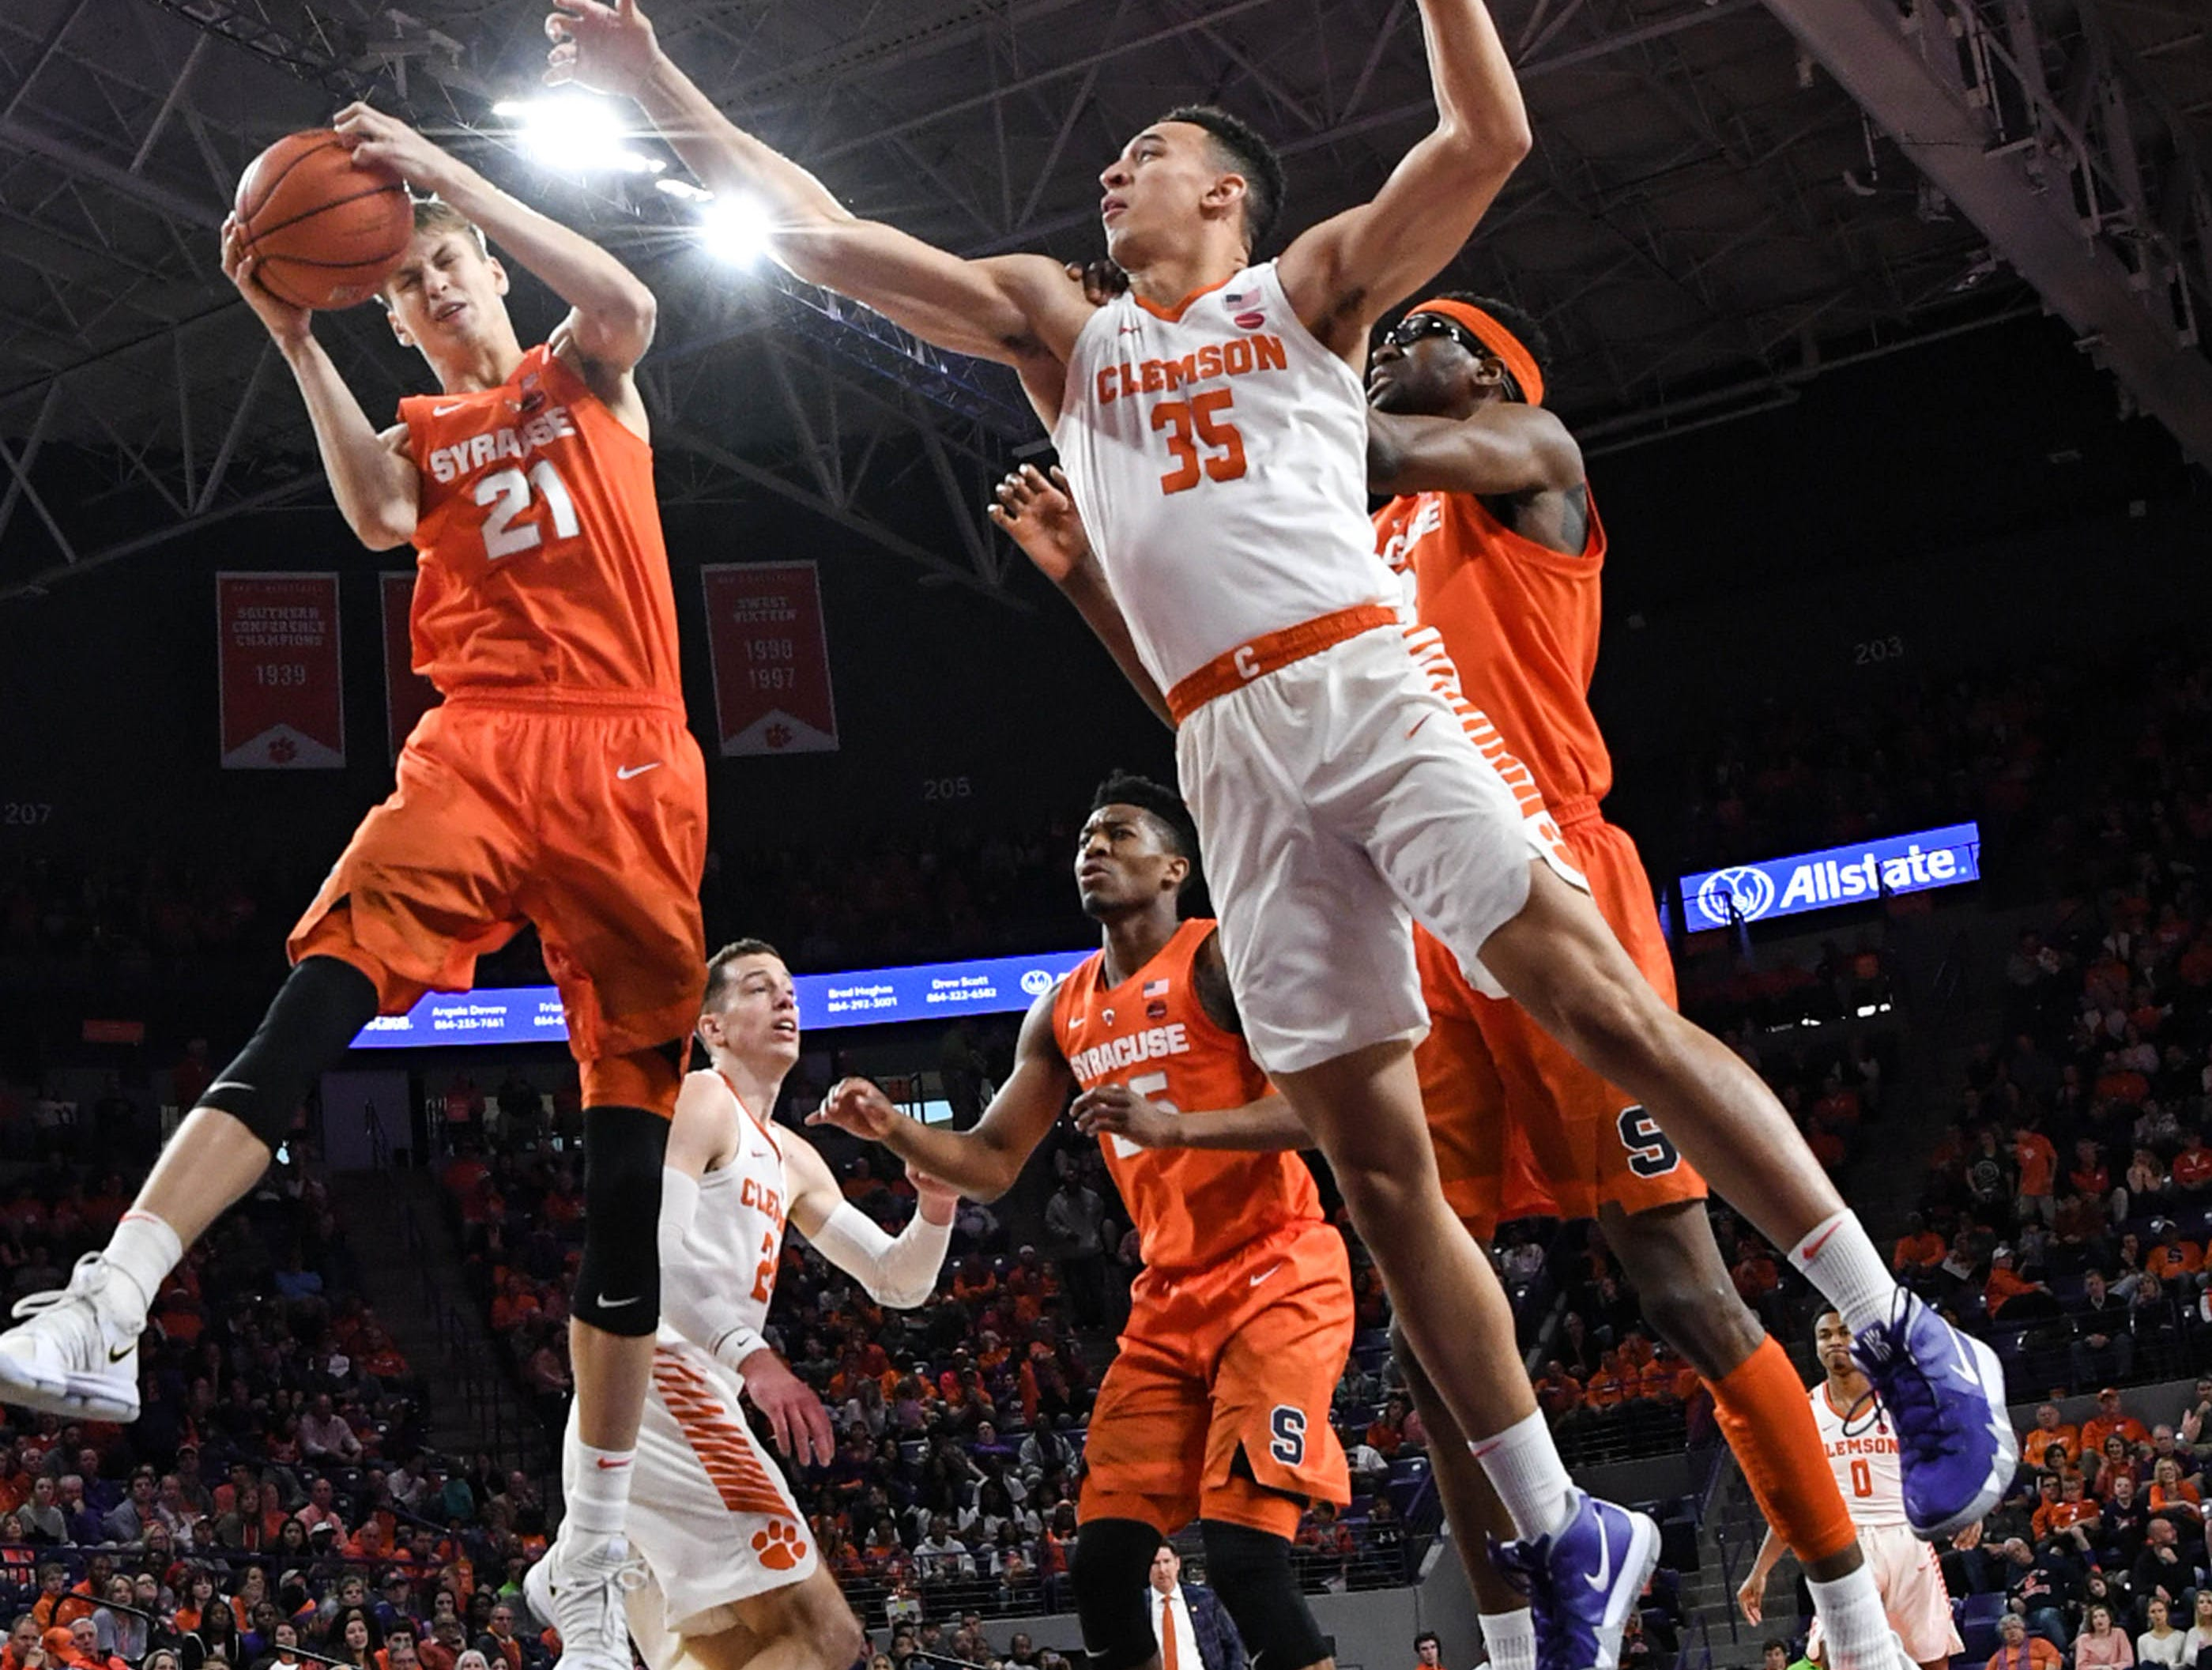 Clemson forward Aamir Simms (25) reaches as Syracuse forward Marek Dolezaj(21)rebounds during the first half in Littlejohn Coliseum in Clemson Saturday, March 9, 2019.